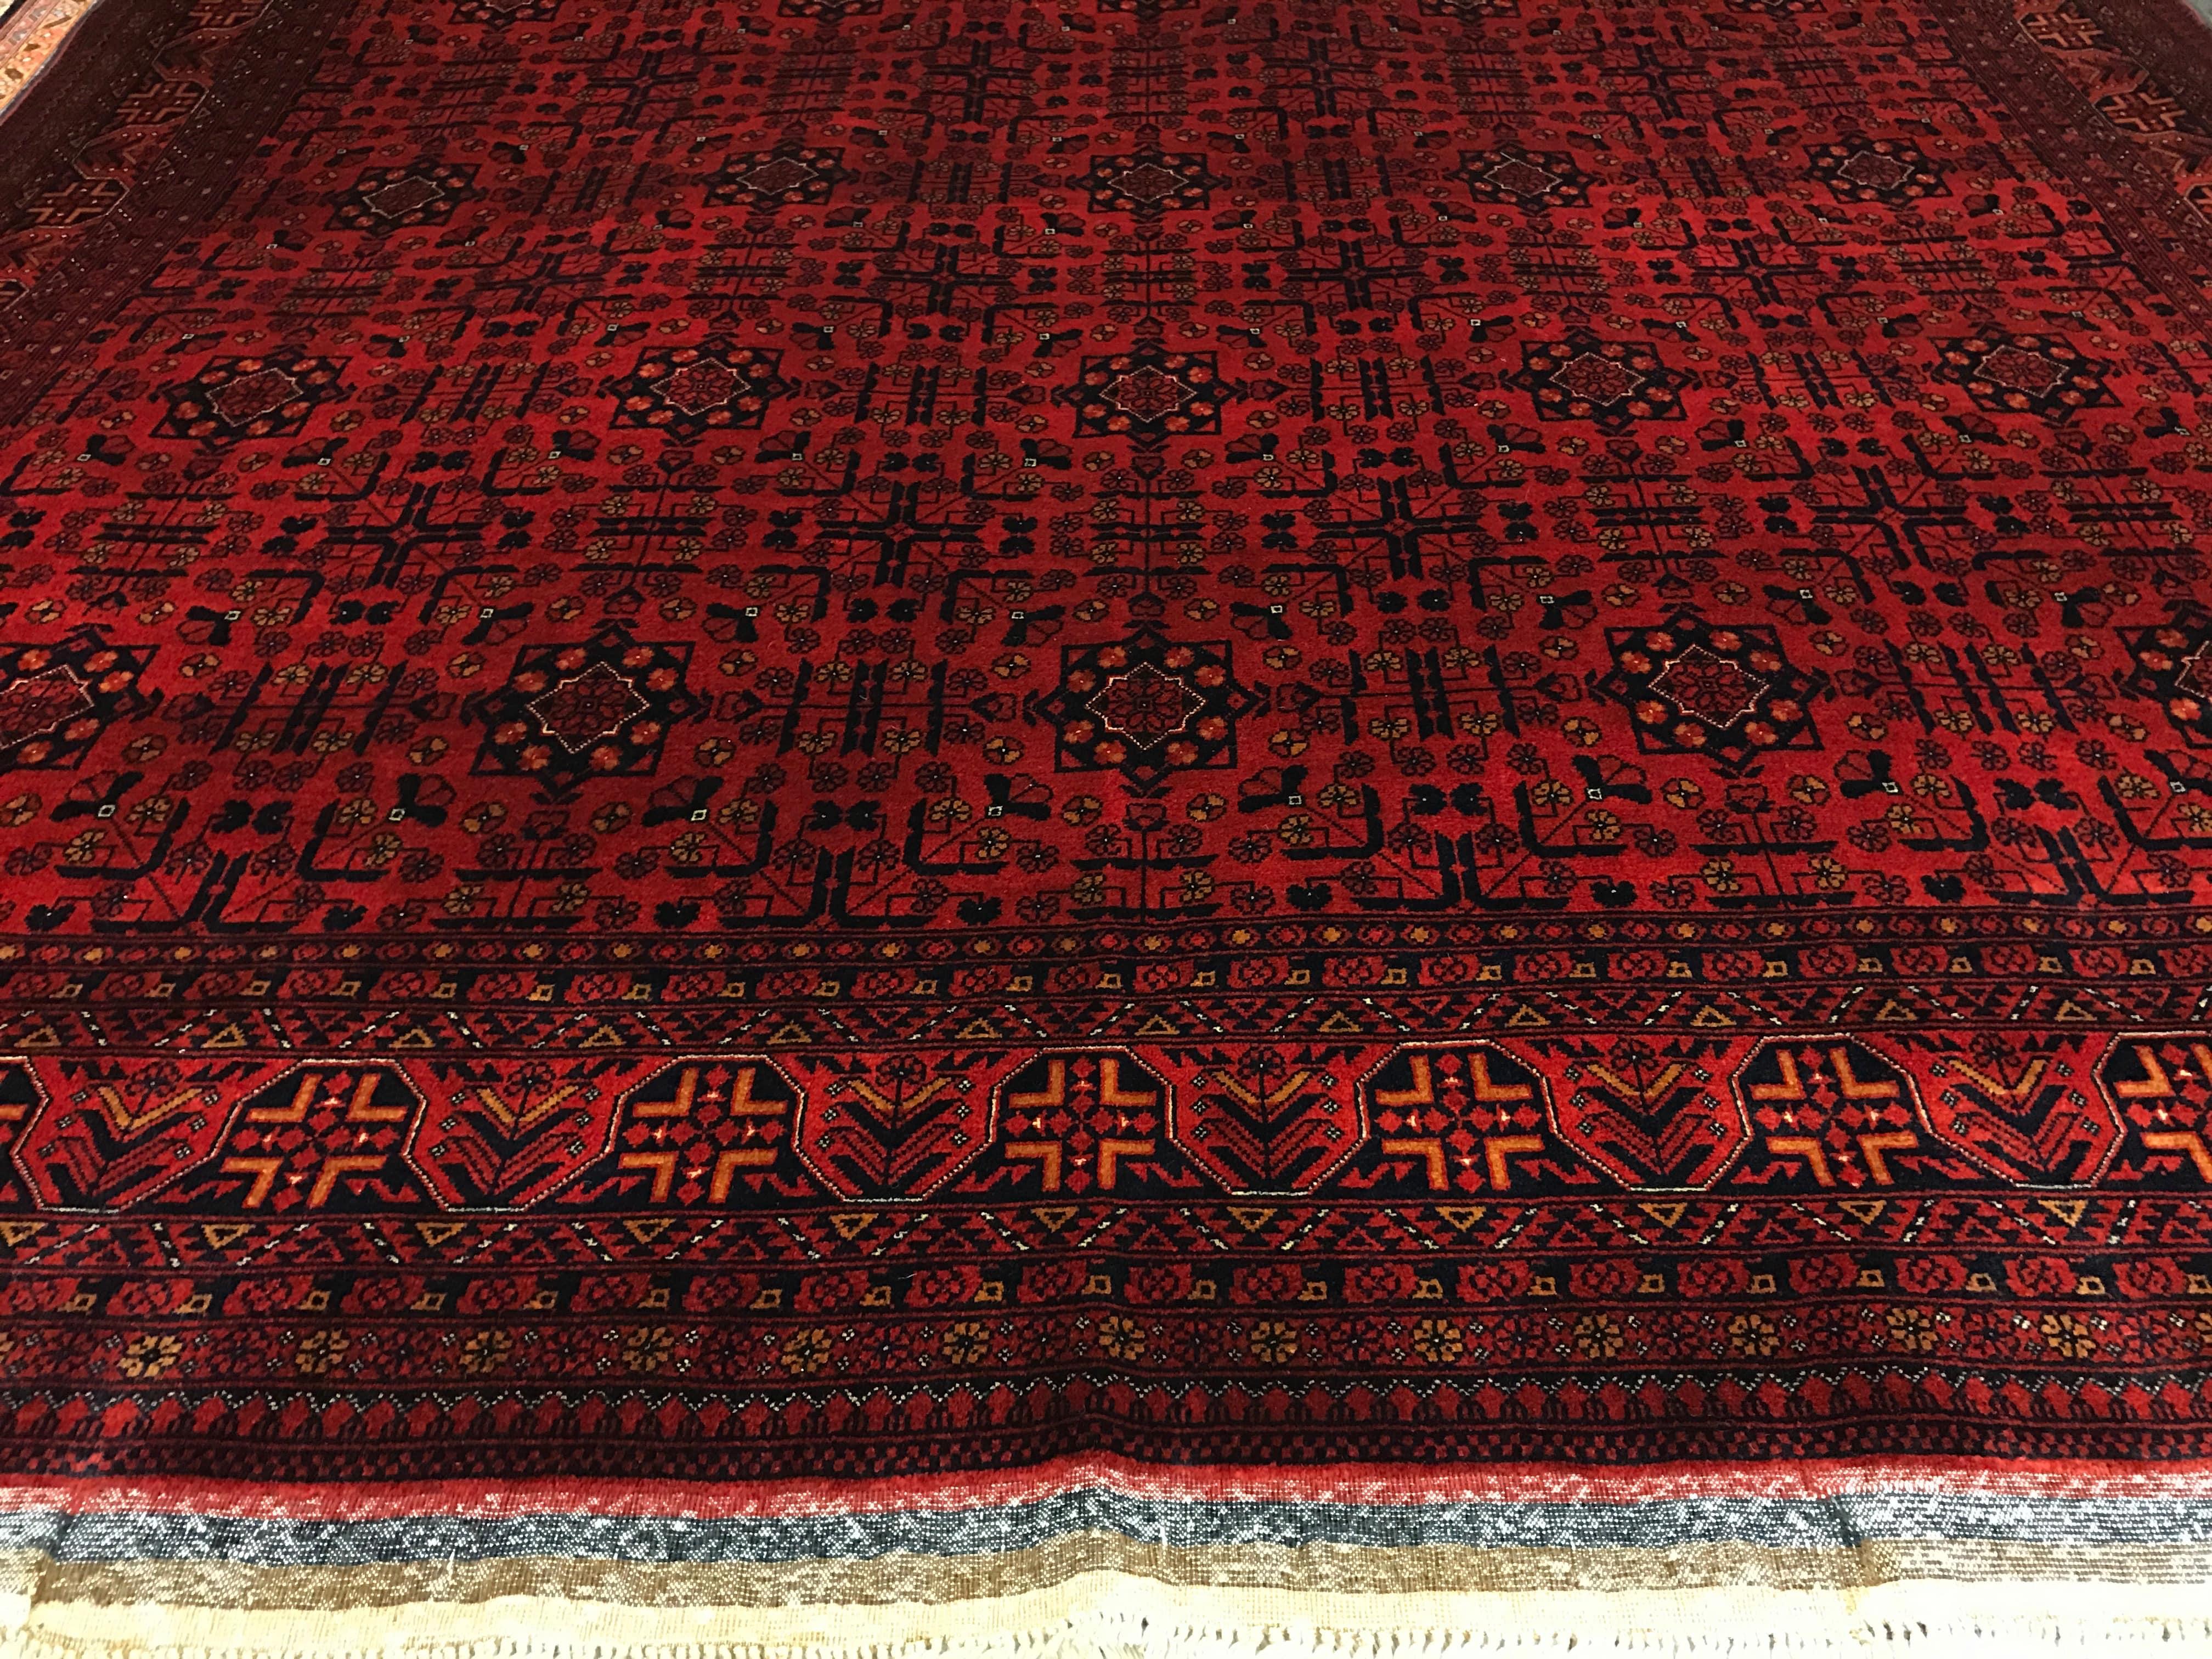 Red Khal Mohammadi Rug Belgian Wool Scottsdale Az Pv Rugs